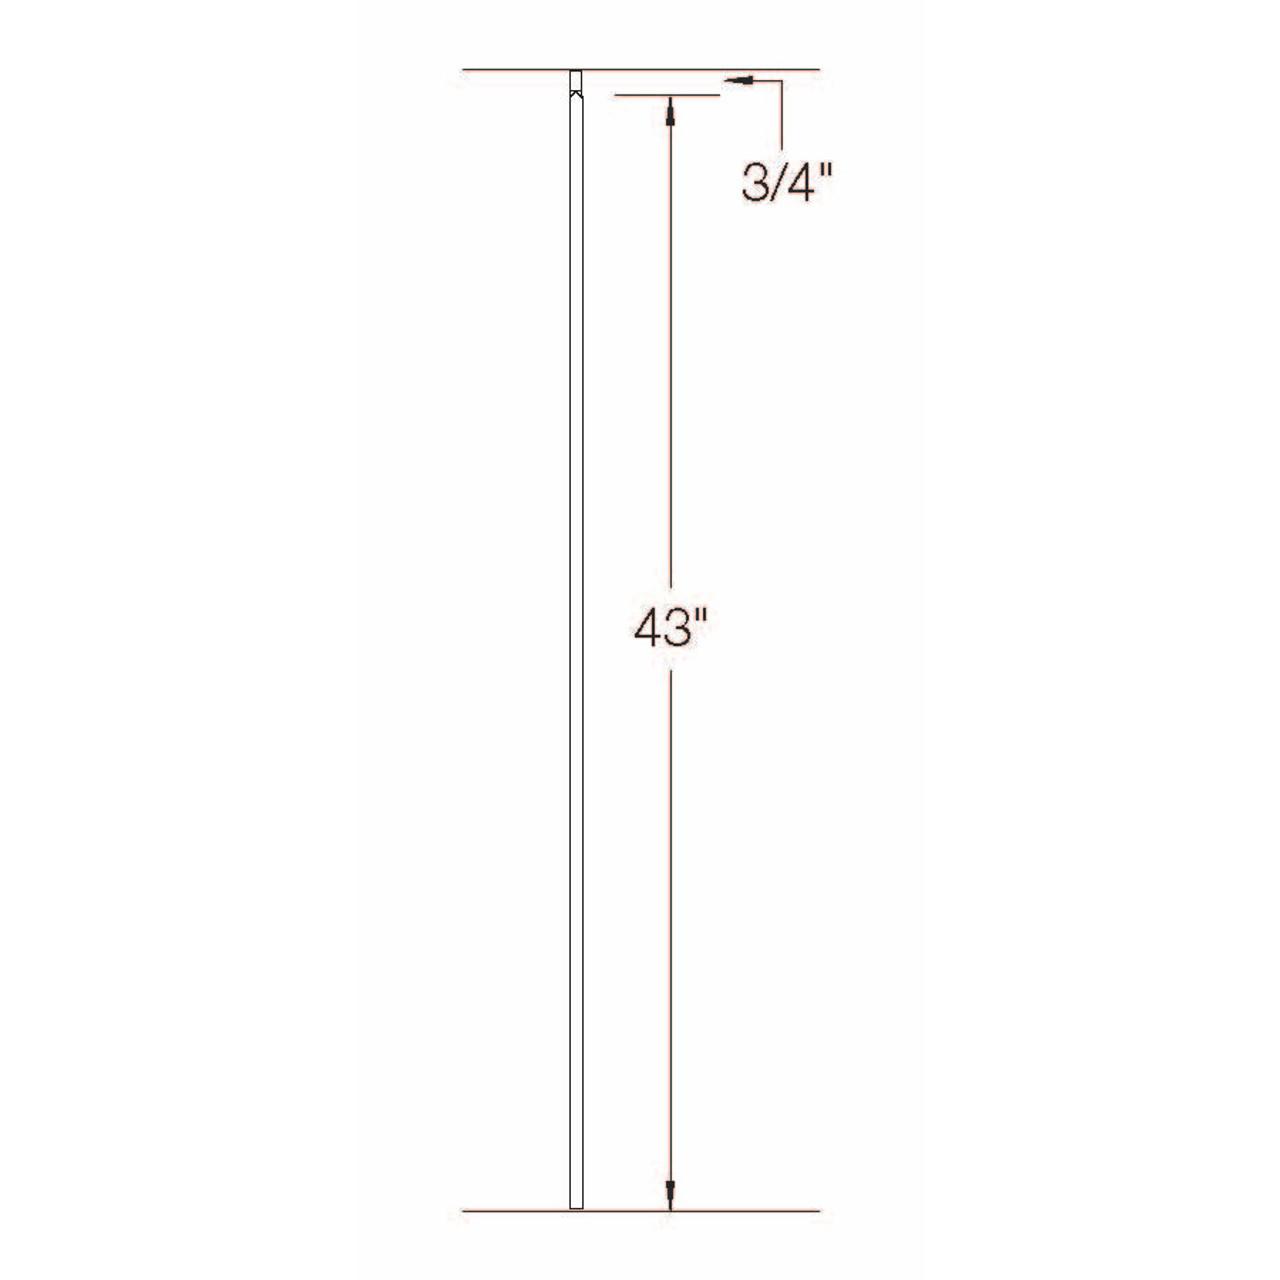 T-01 12mm Plain Bar, Tubular Steel Dimensional Information